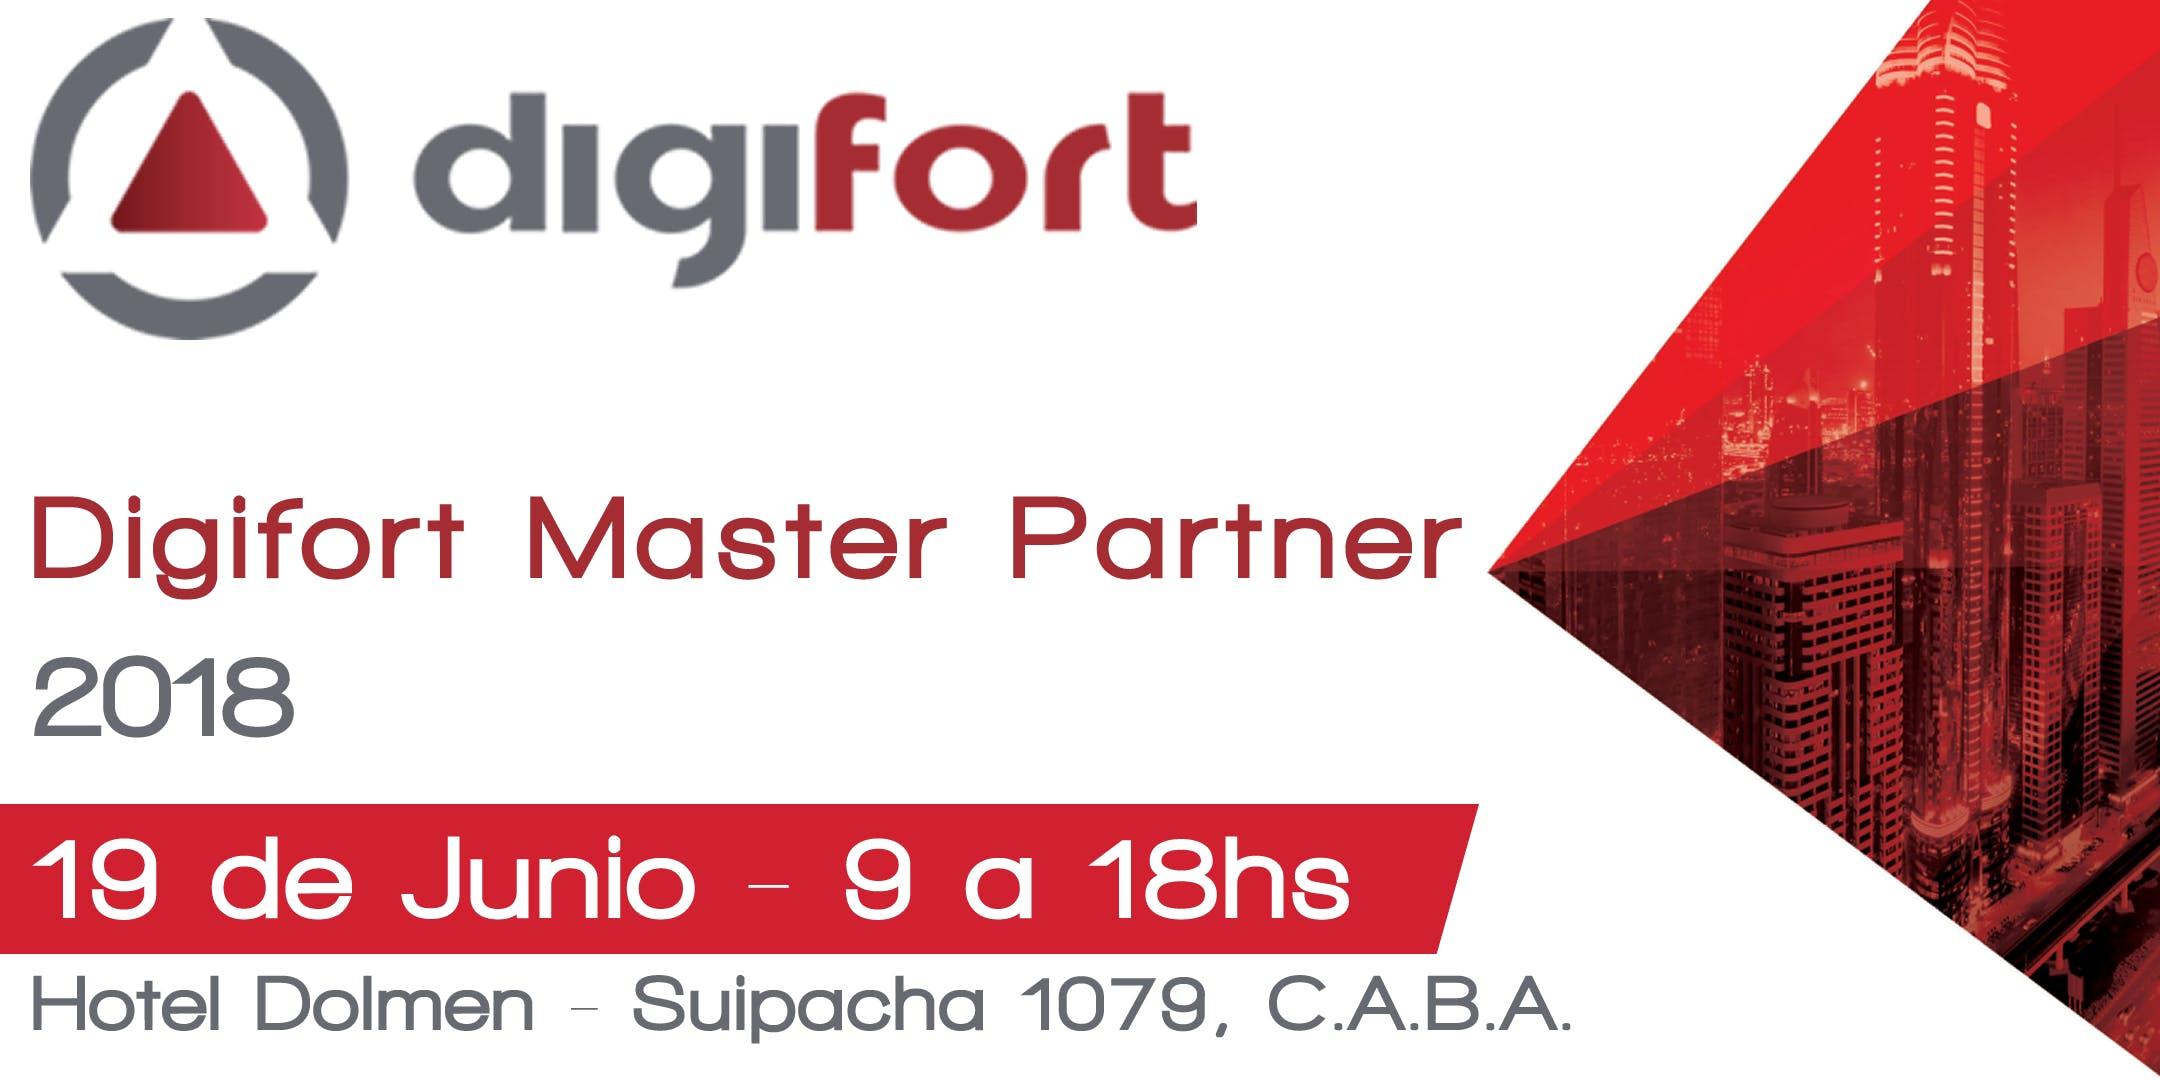 Digifort Master Partner Buenos Aires 2018